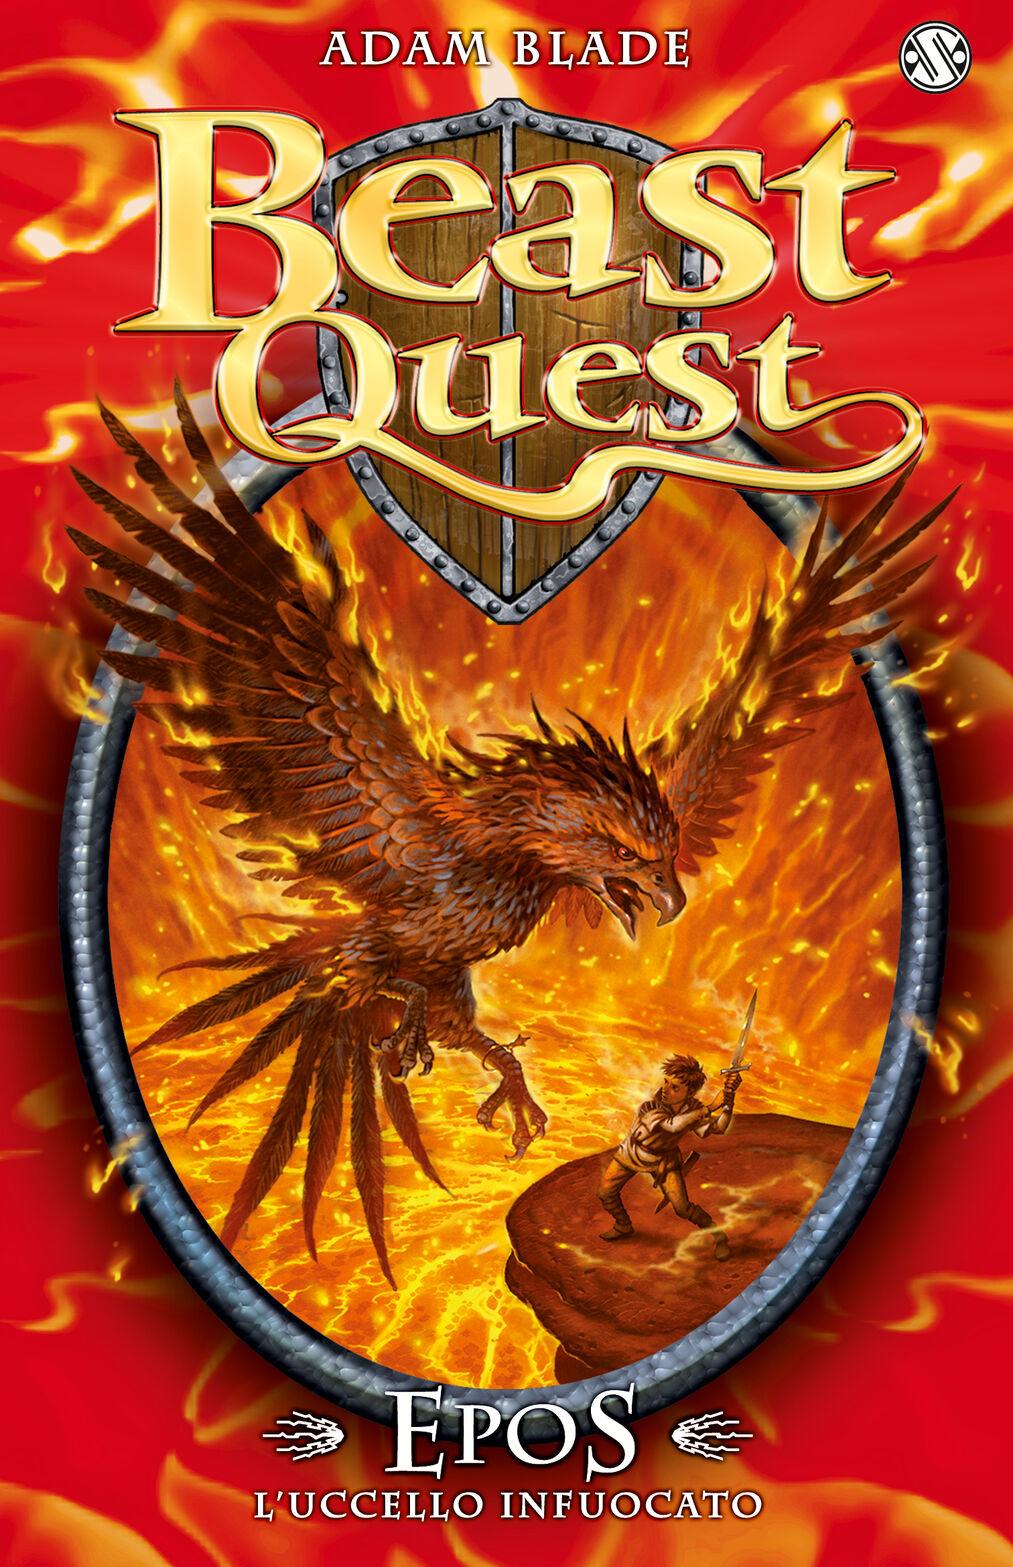 Epos. L'uccello infuocato. Beast Quest. Vol. 6